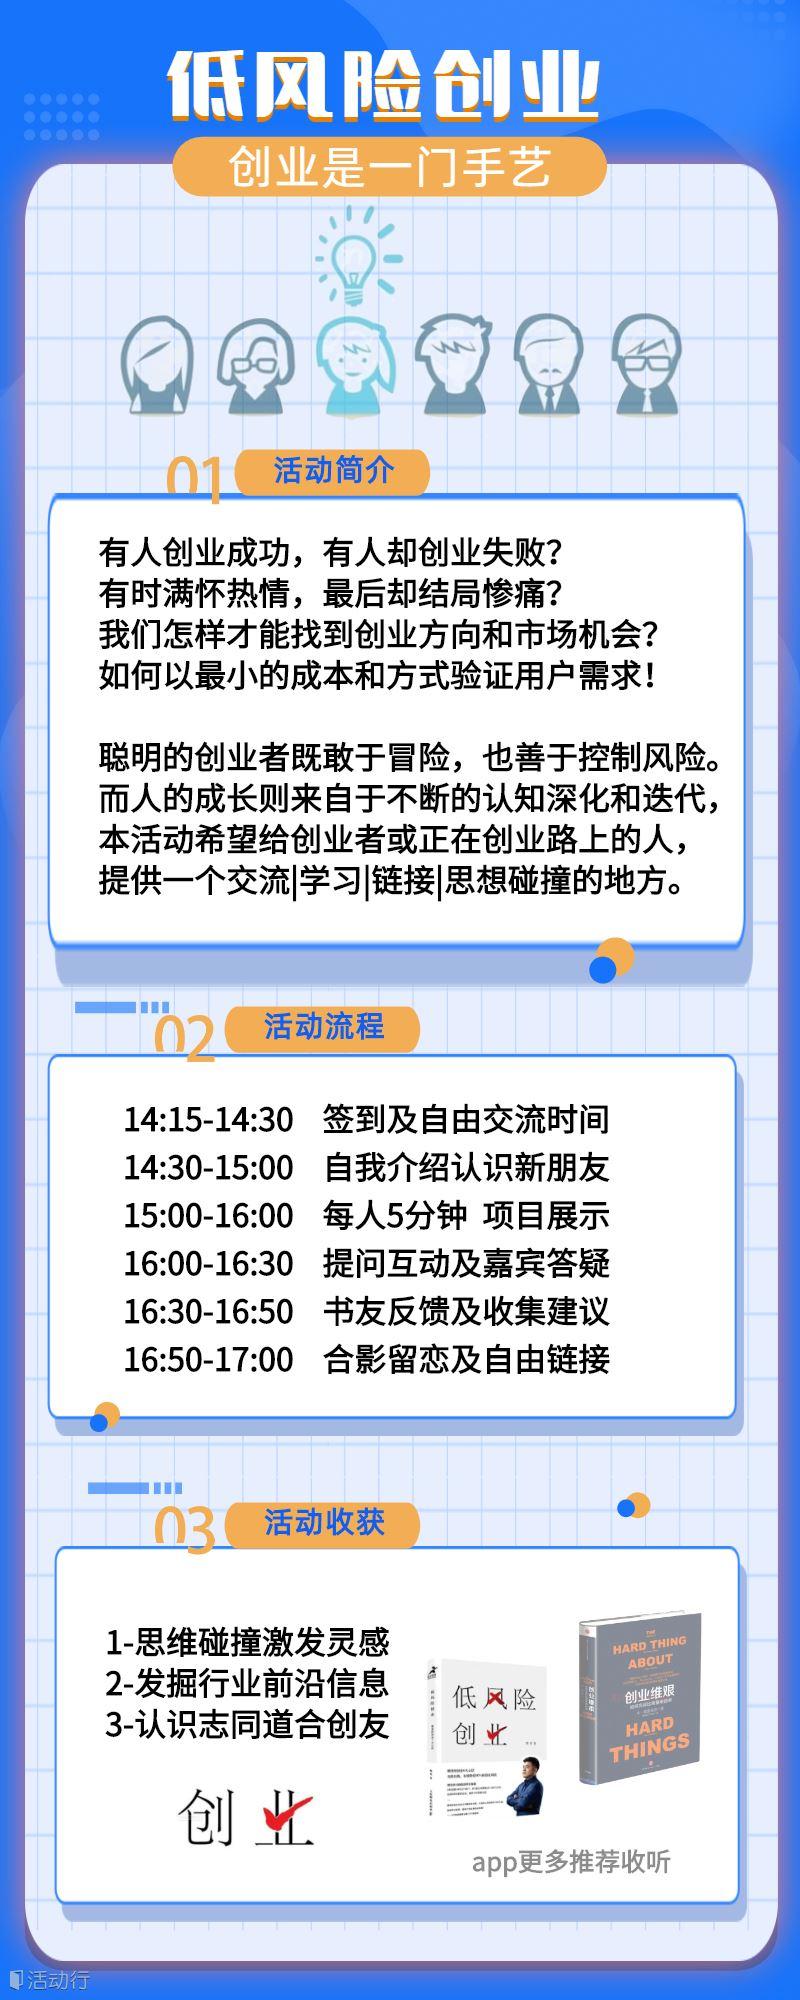 http://www.huodongxing.com/file/20191230/8863650425811/304112446174618.jpg